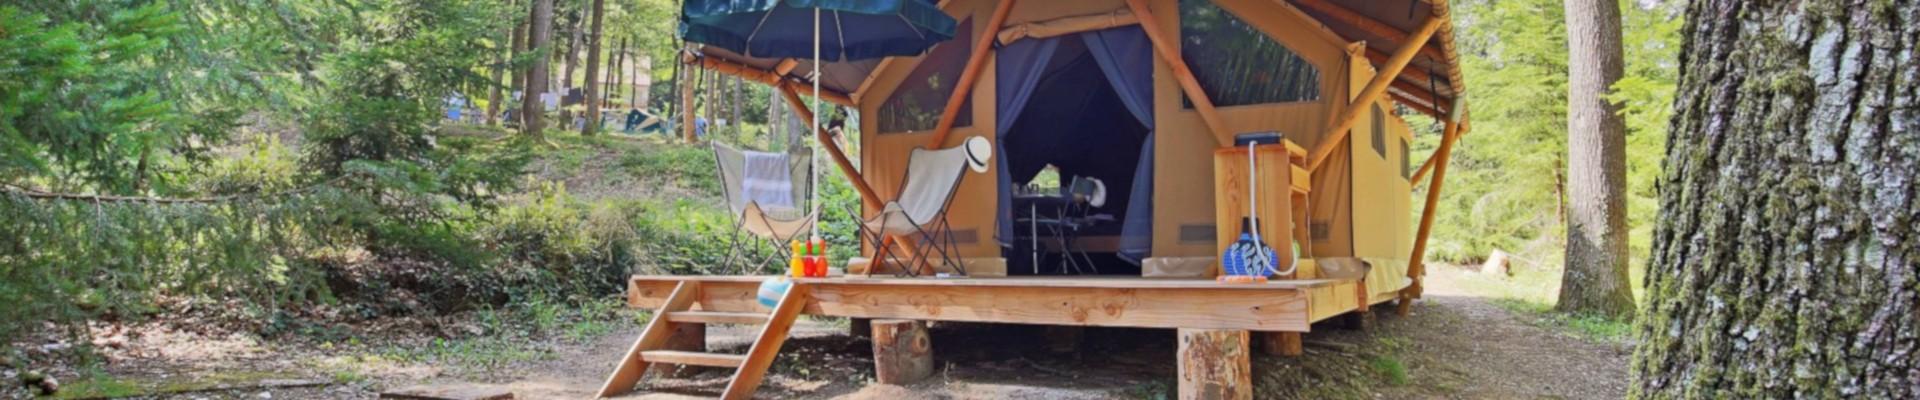 Camping à Bozel